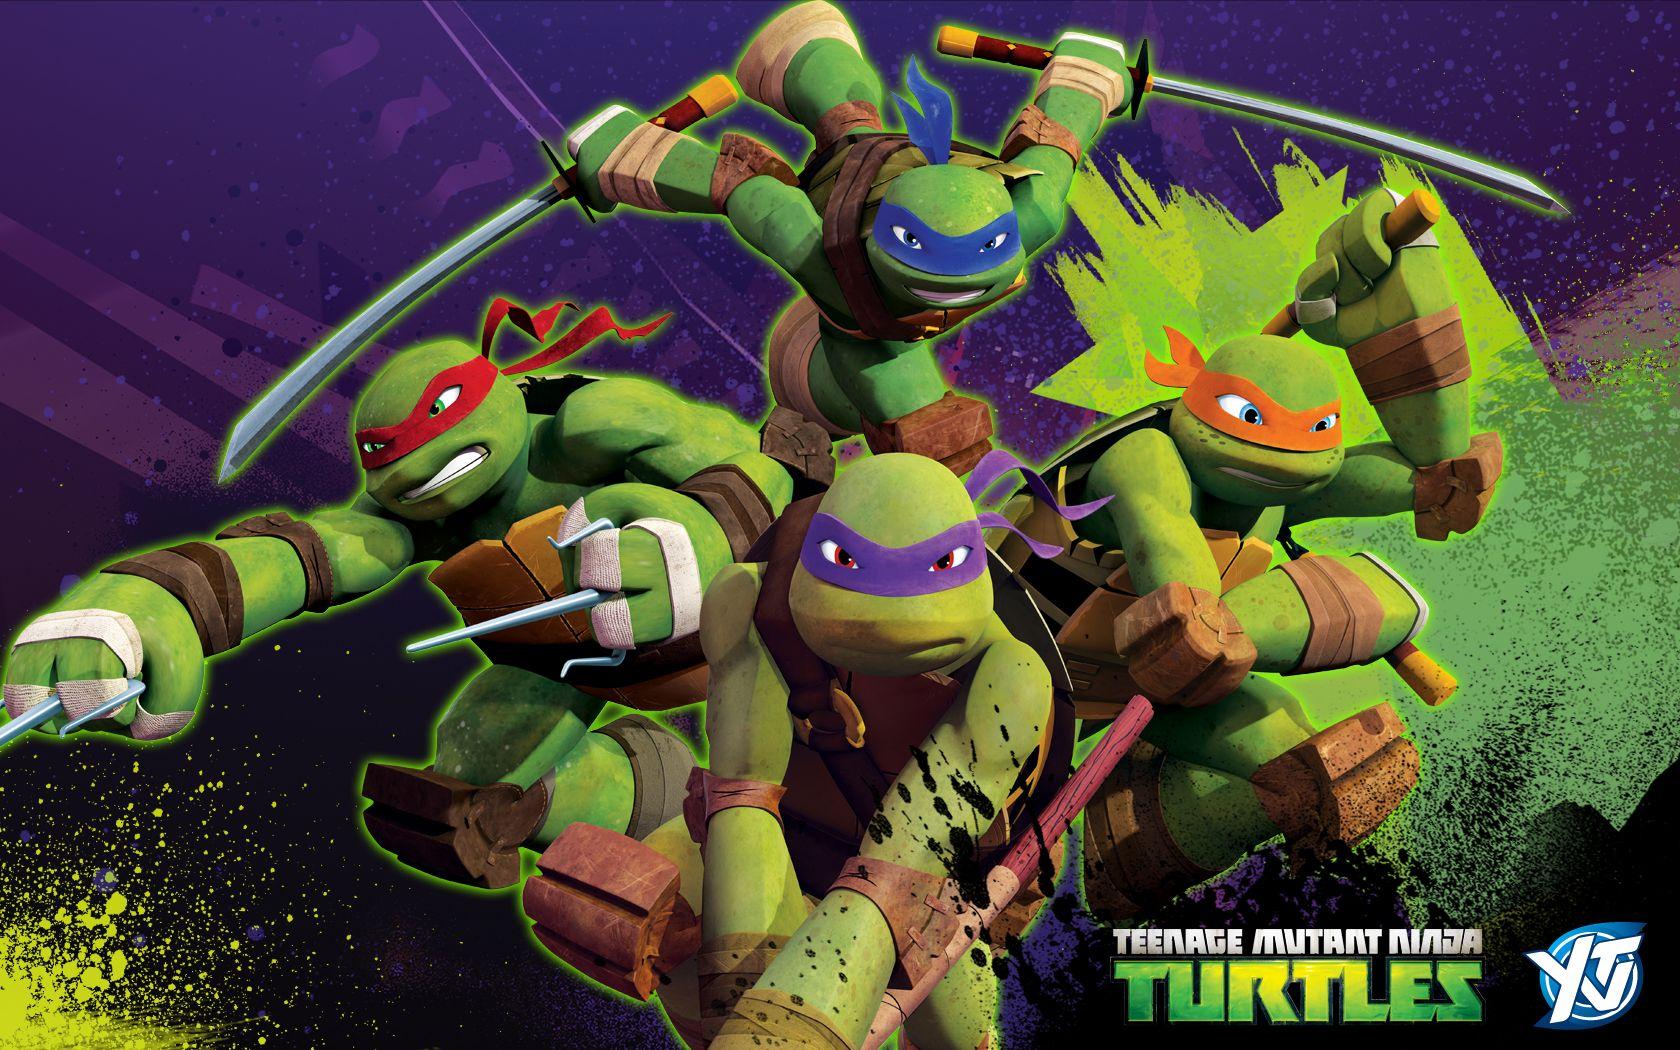 teenage mutant ninja turtles wallpaper wallpaperesque | hd